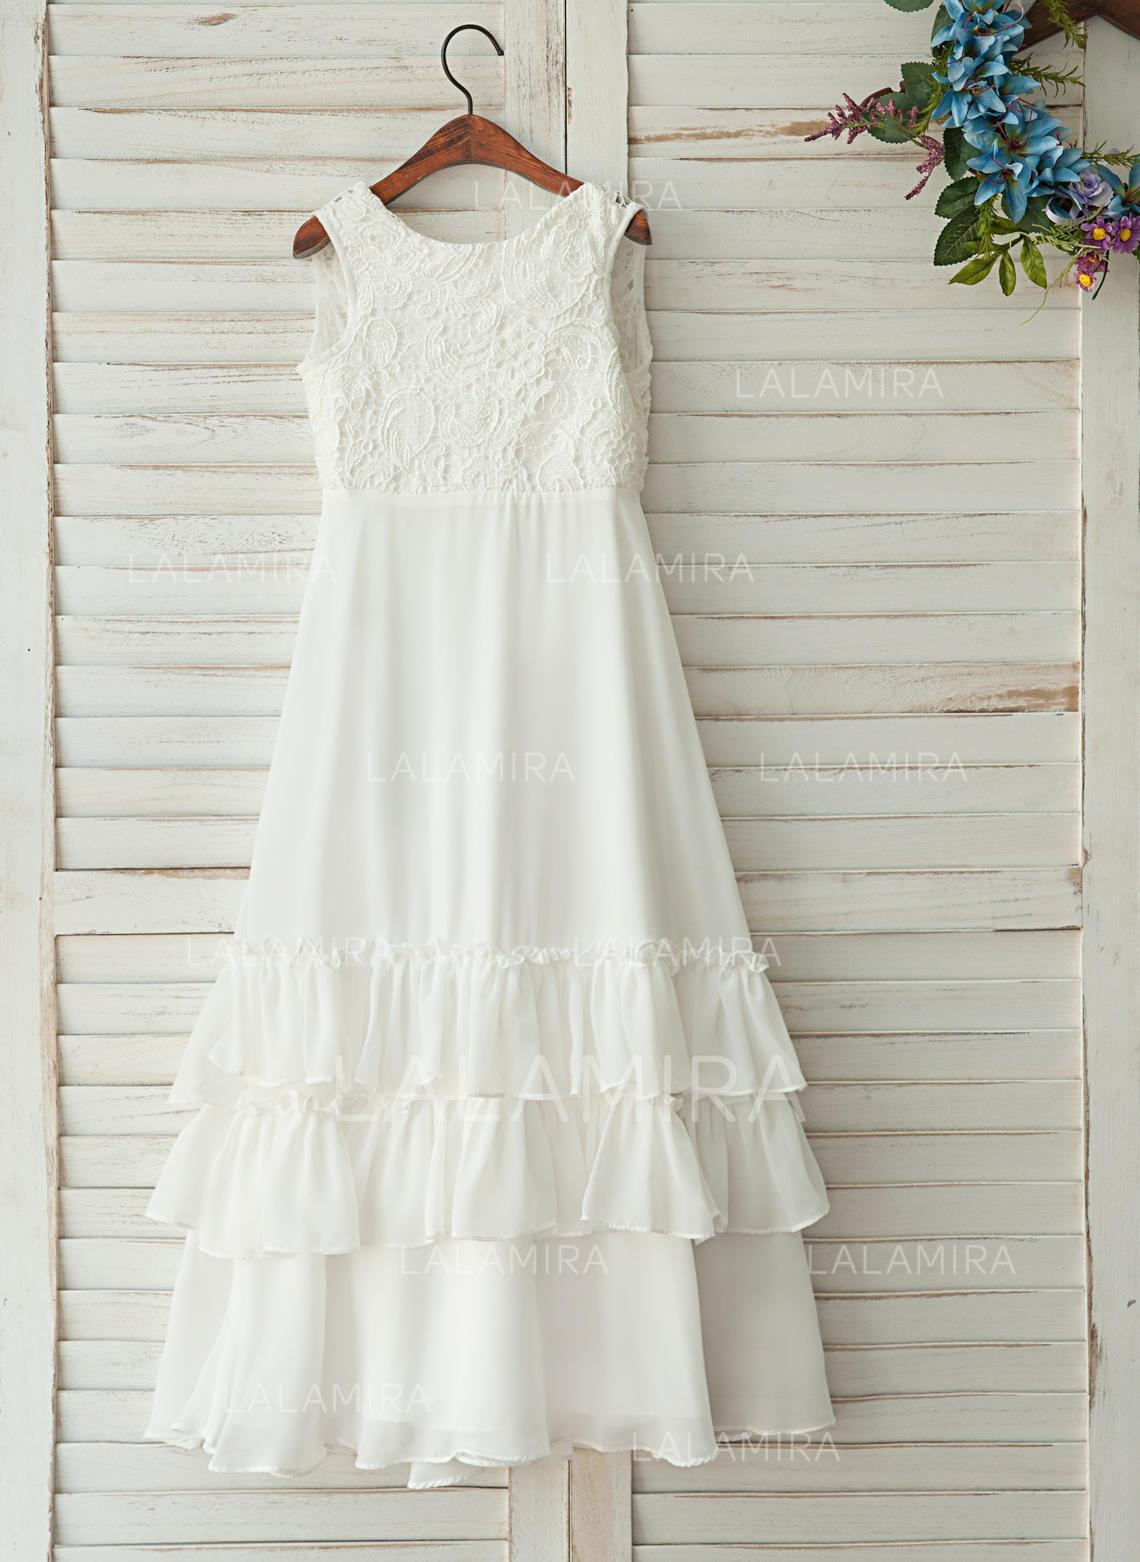 b3ece74c9e8 A-Line Princess Floor-length Flower Girl Dress - Chiffon Satin . Loading  zoom